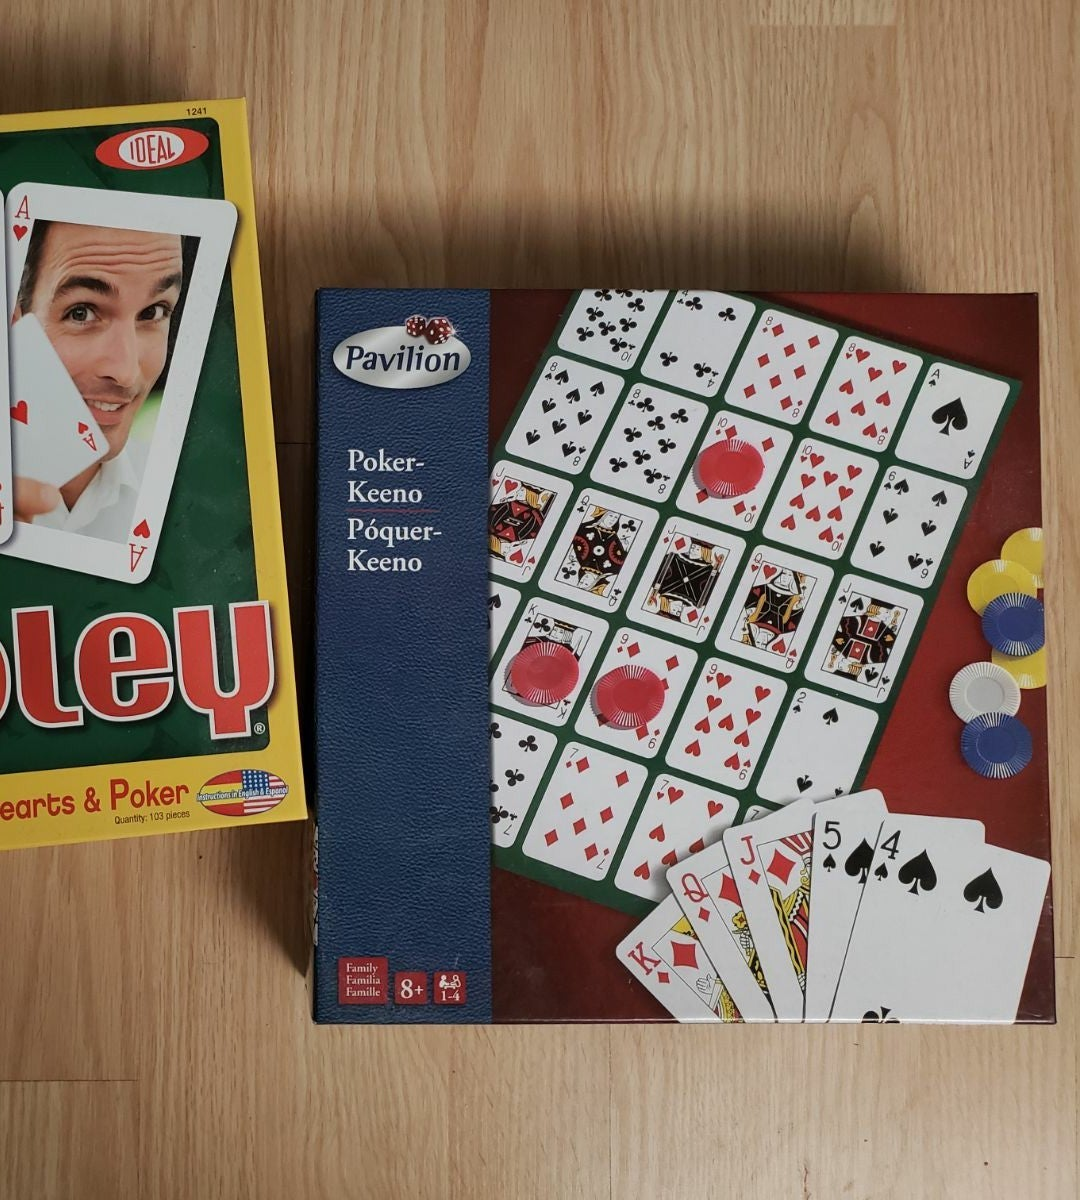 Family games Tripoly and Pokerkeeno